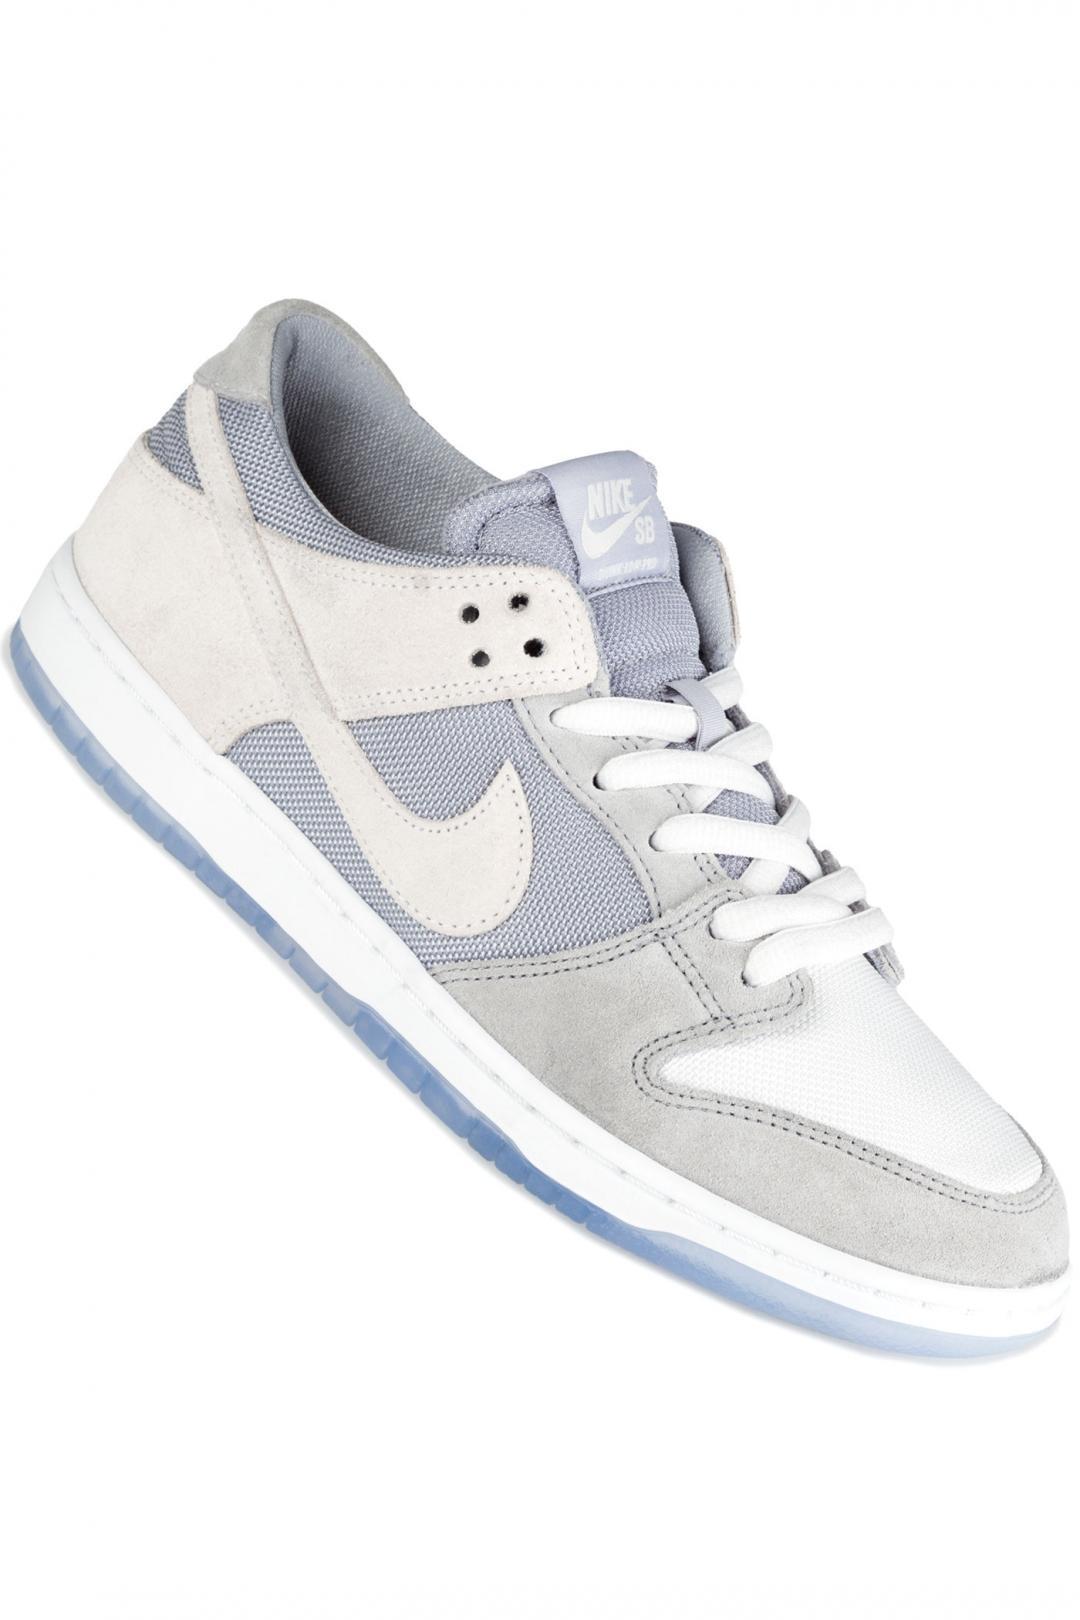 Uomo Nike SB Dunk Low Pro wolf grey summit white | Sneakers low top